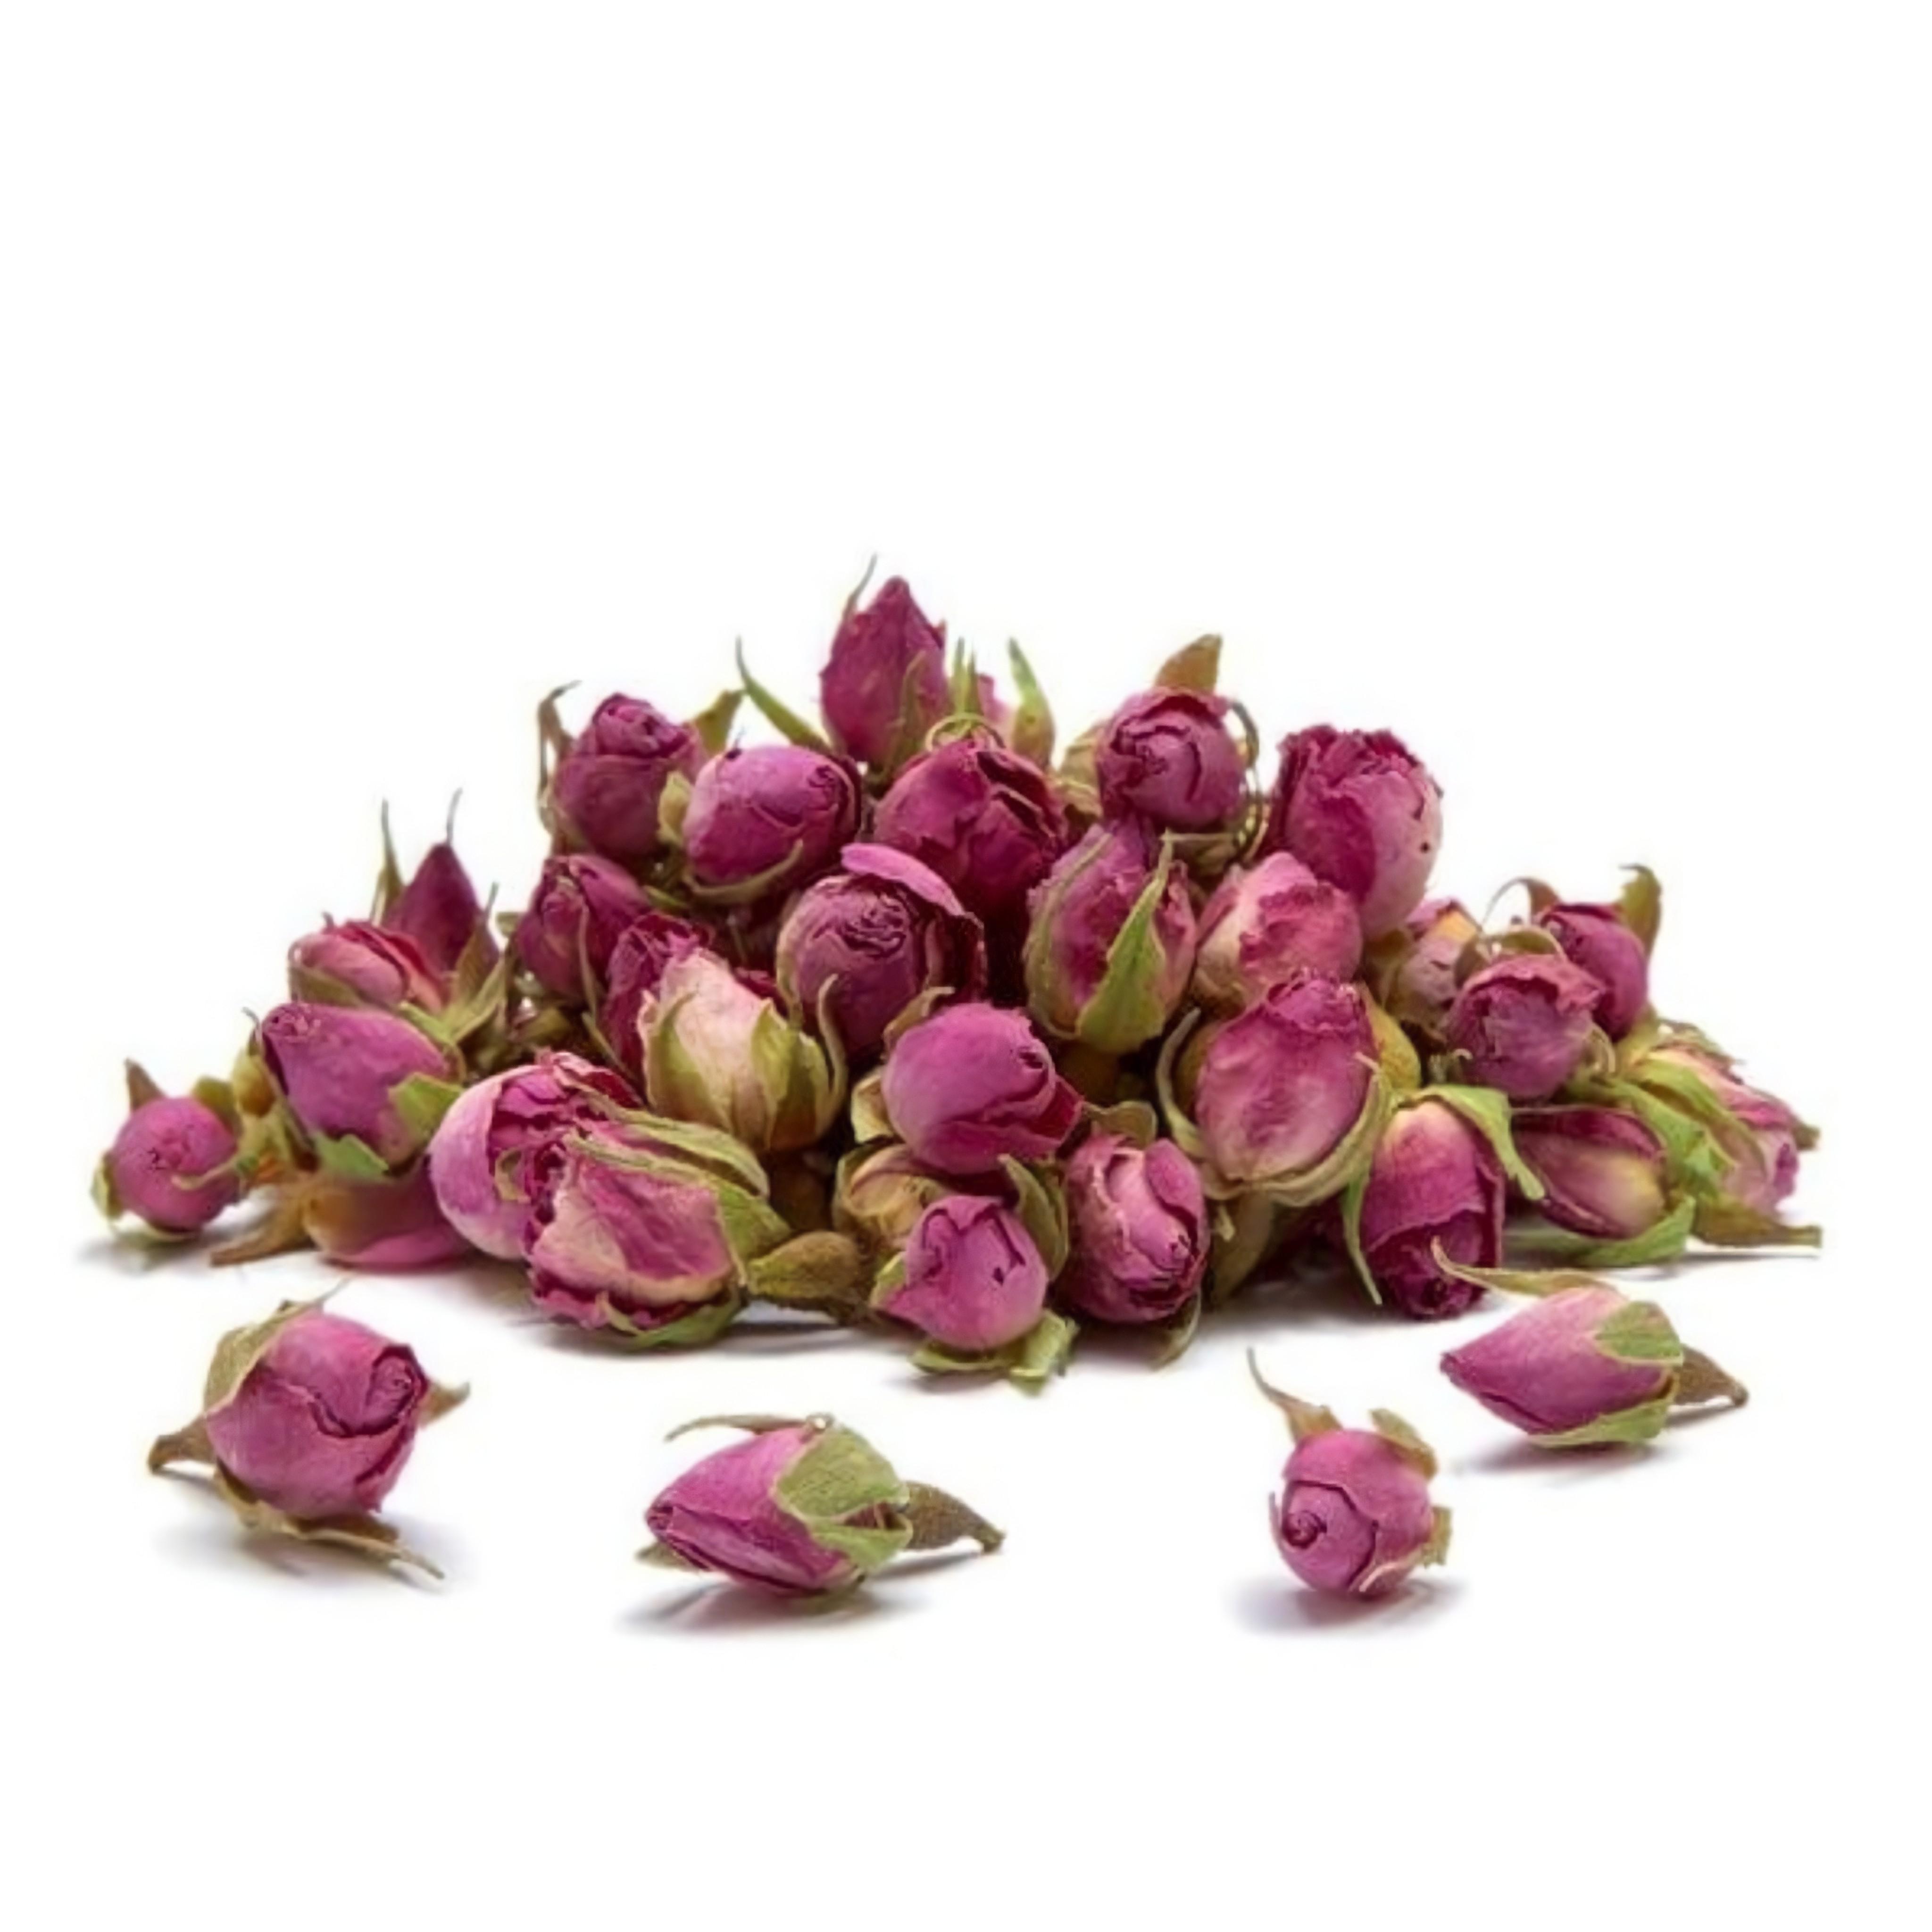 buy rose buds